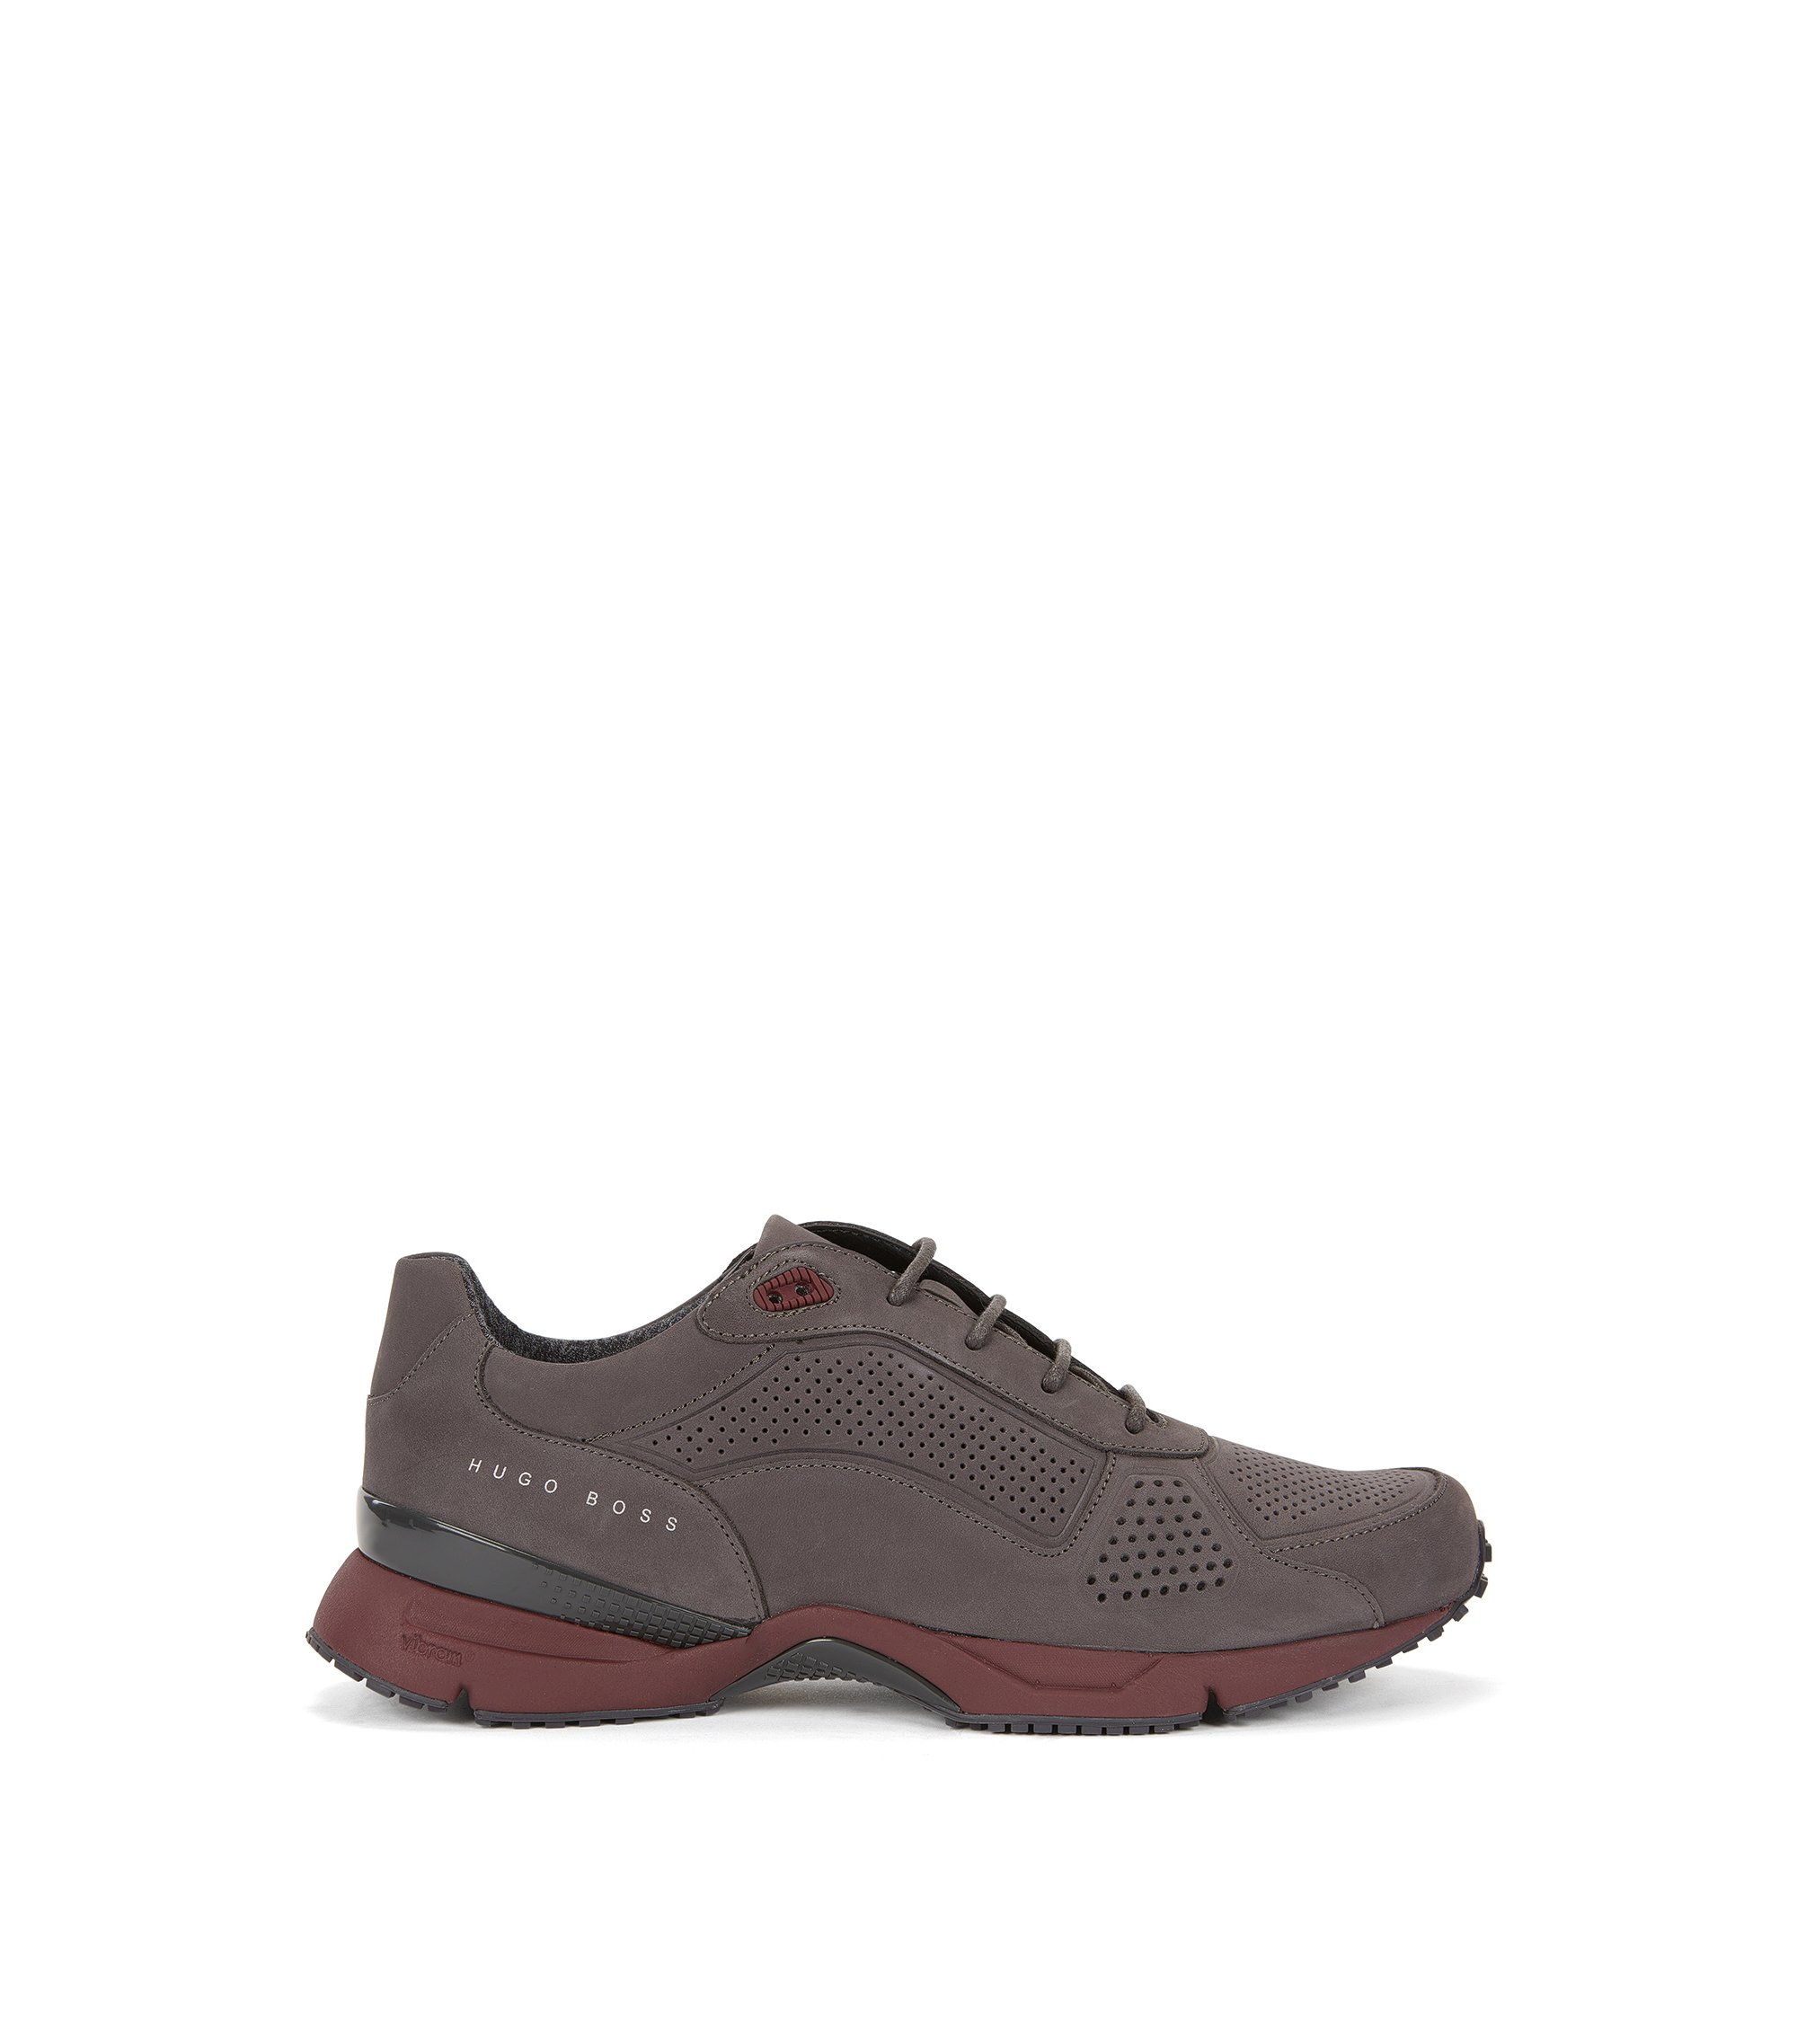 Perforated Suede Sneaker | Velocity Runn Nupf, Dark Grey